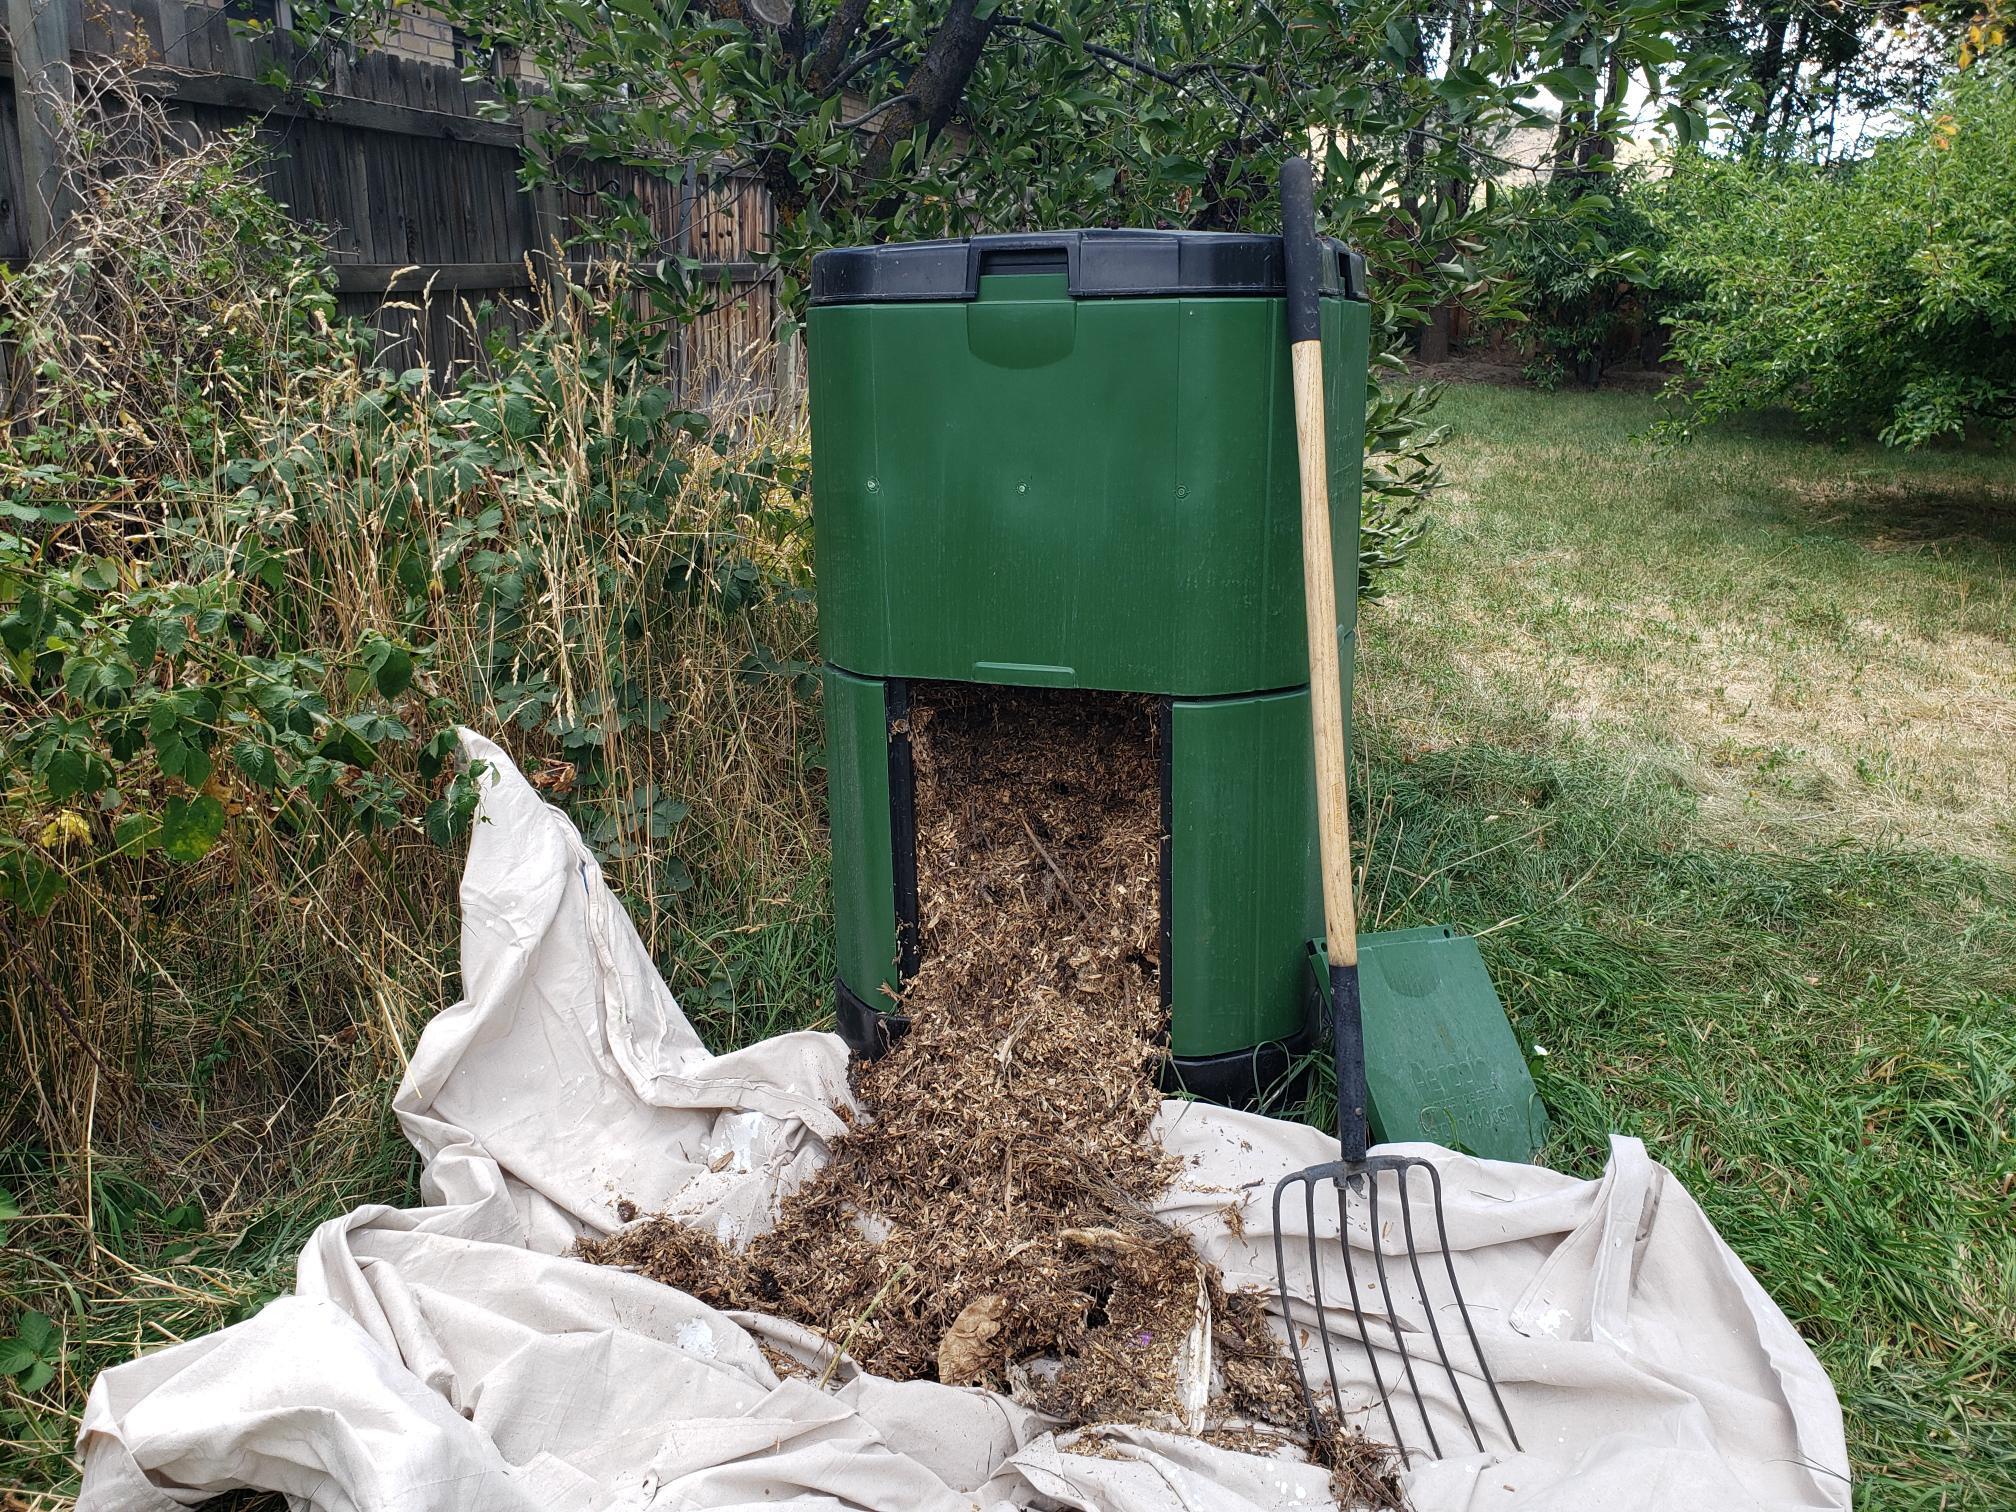 2019 09 03 compost bin experiment 1.jpg